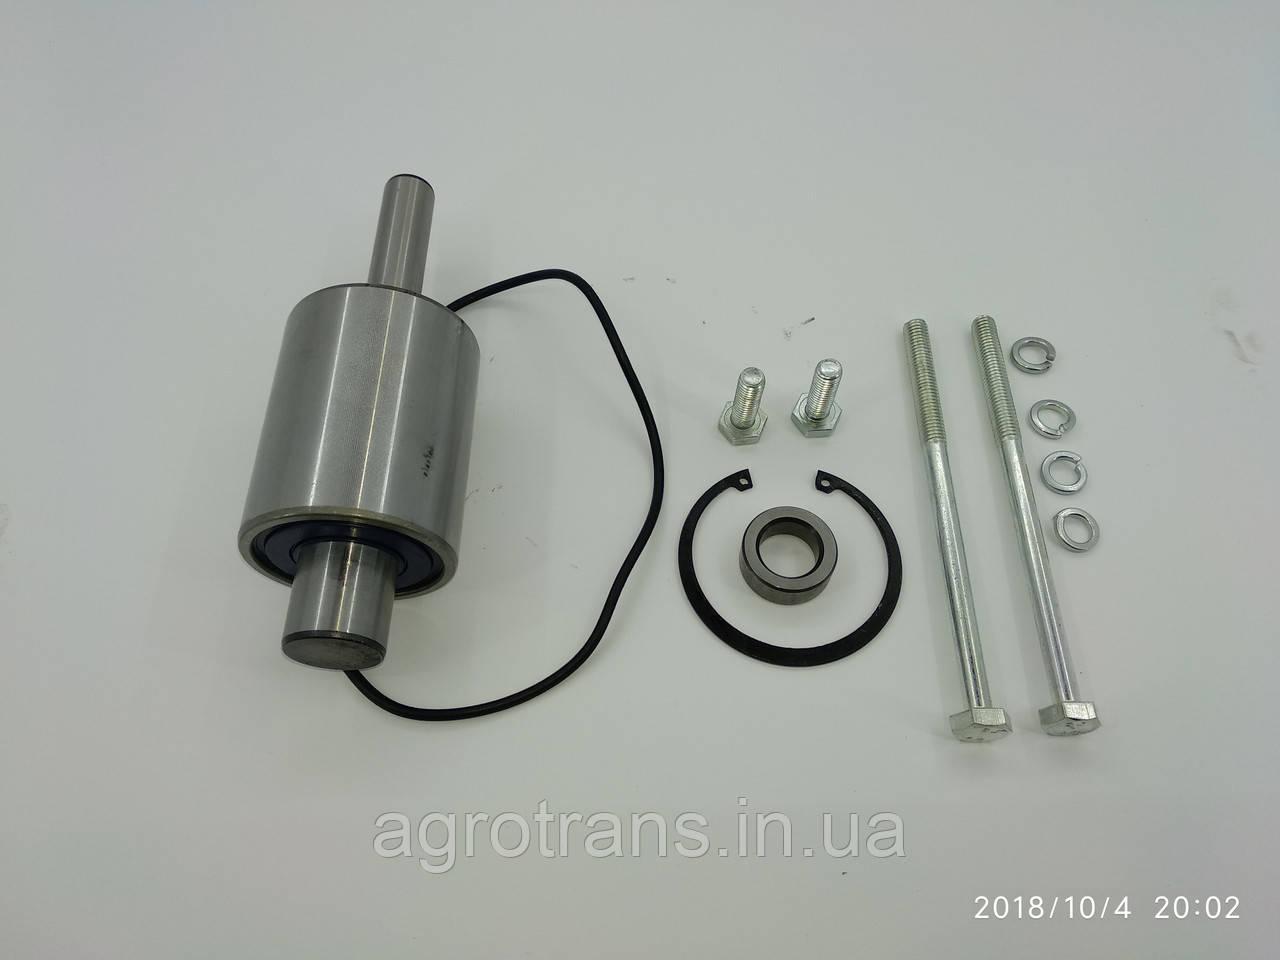 Ремкомплект водяного насоса КАМАЗ ЕВРО-2 7406-1307000 (12 единиц). Ремкомплект помпы КАМАЗ Евро-2